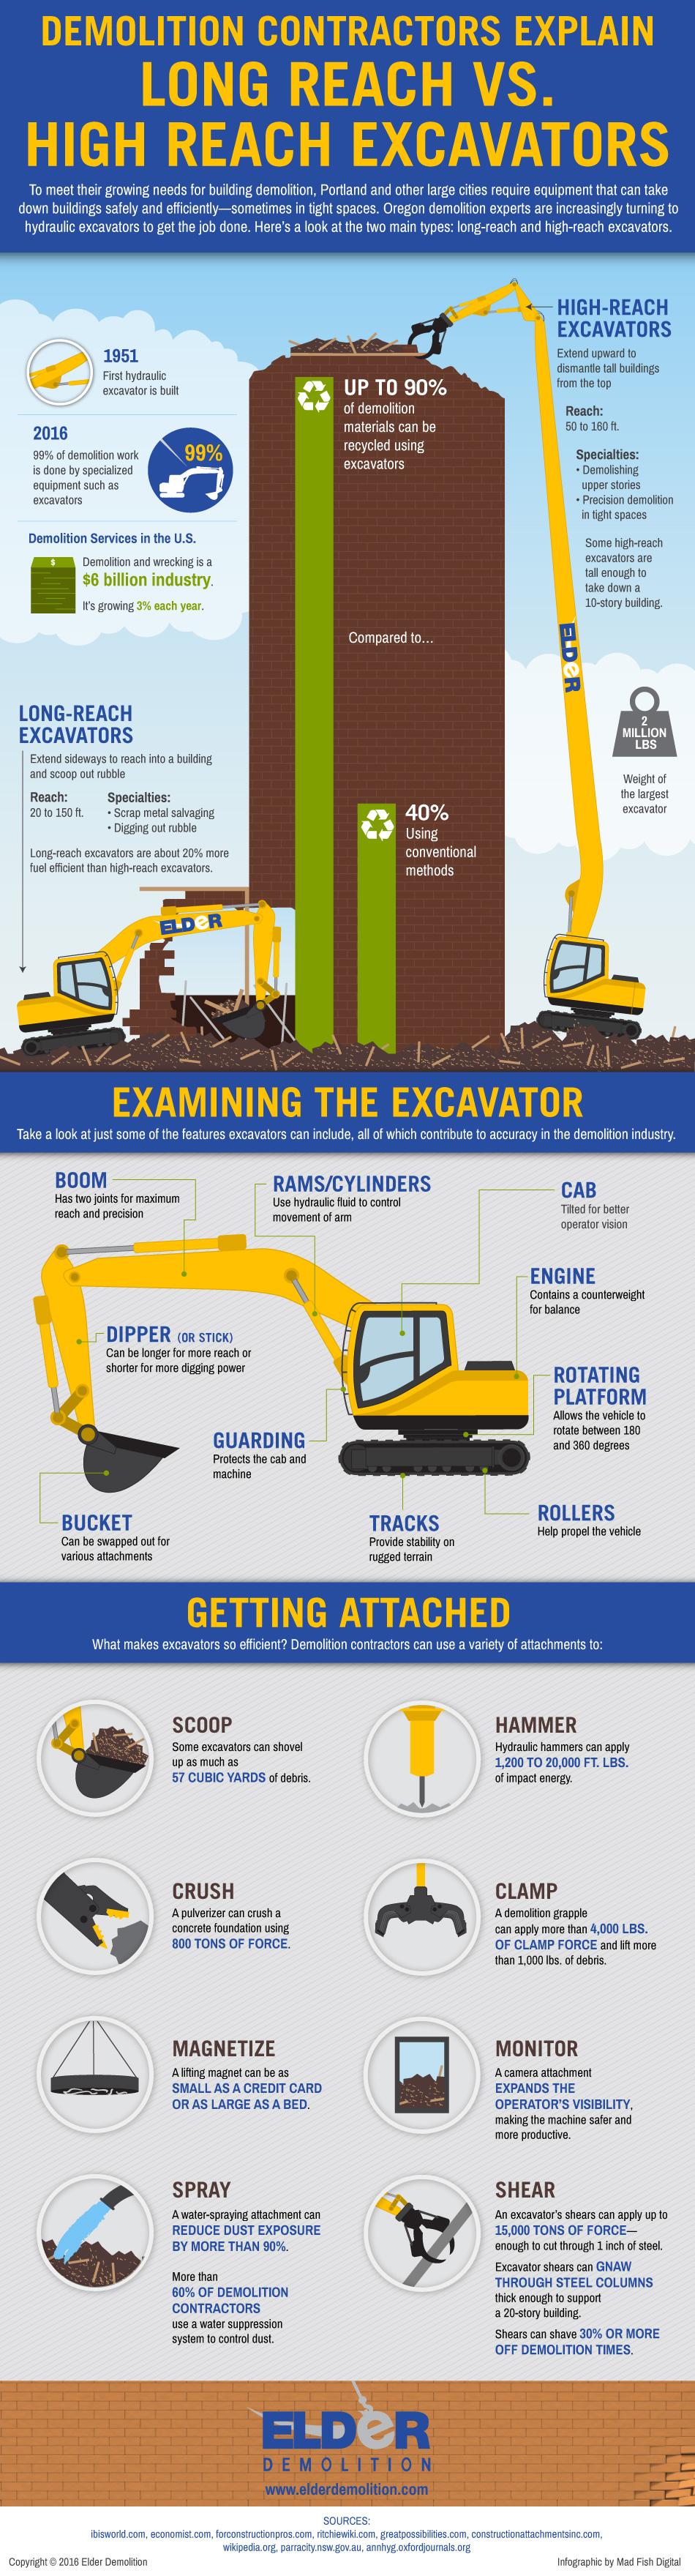 How Demolition Contractors Use Long / High Reach Excavators